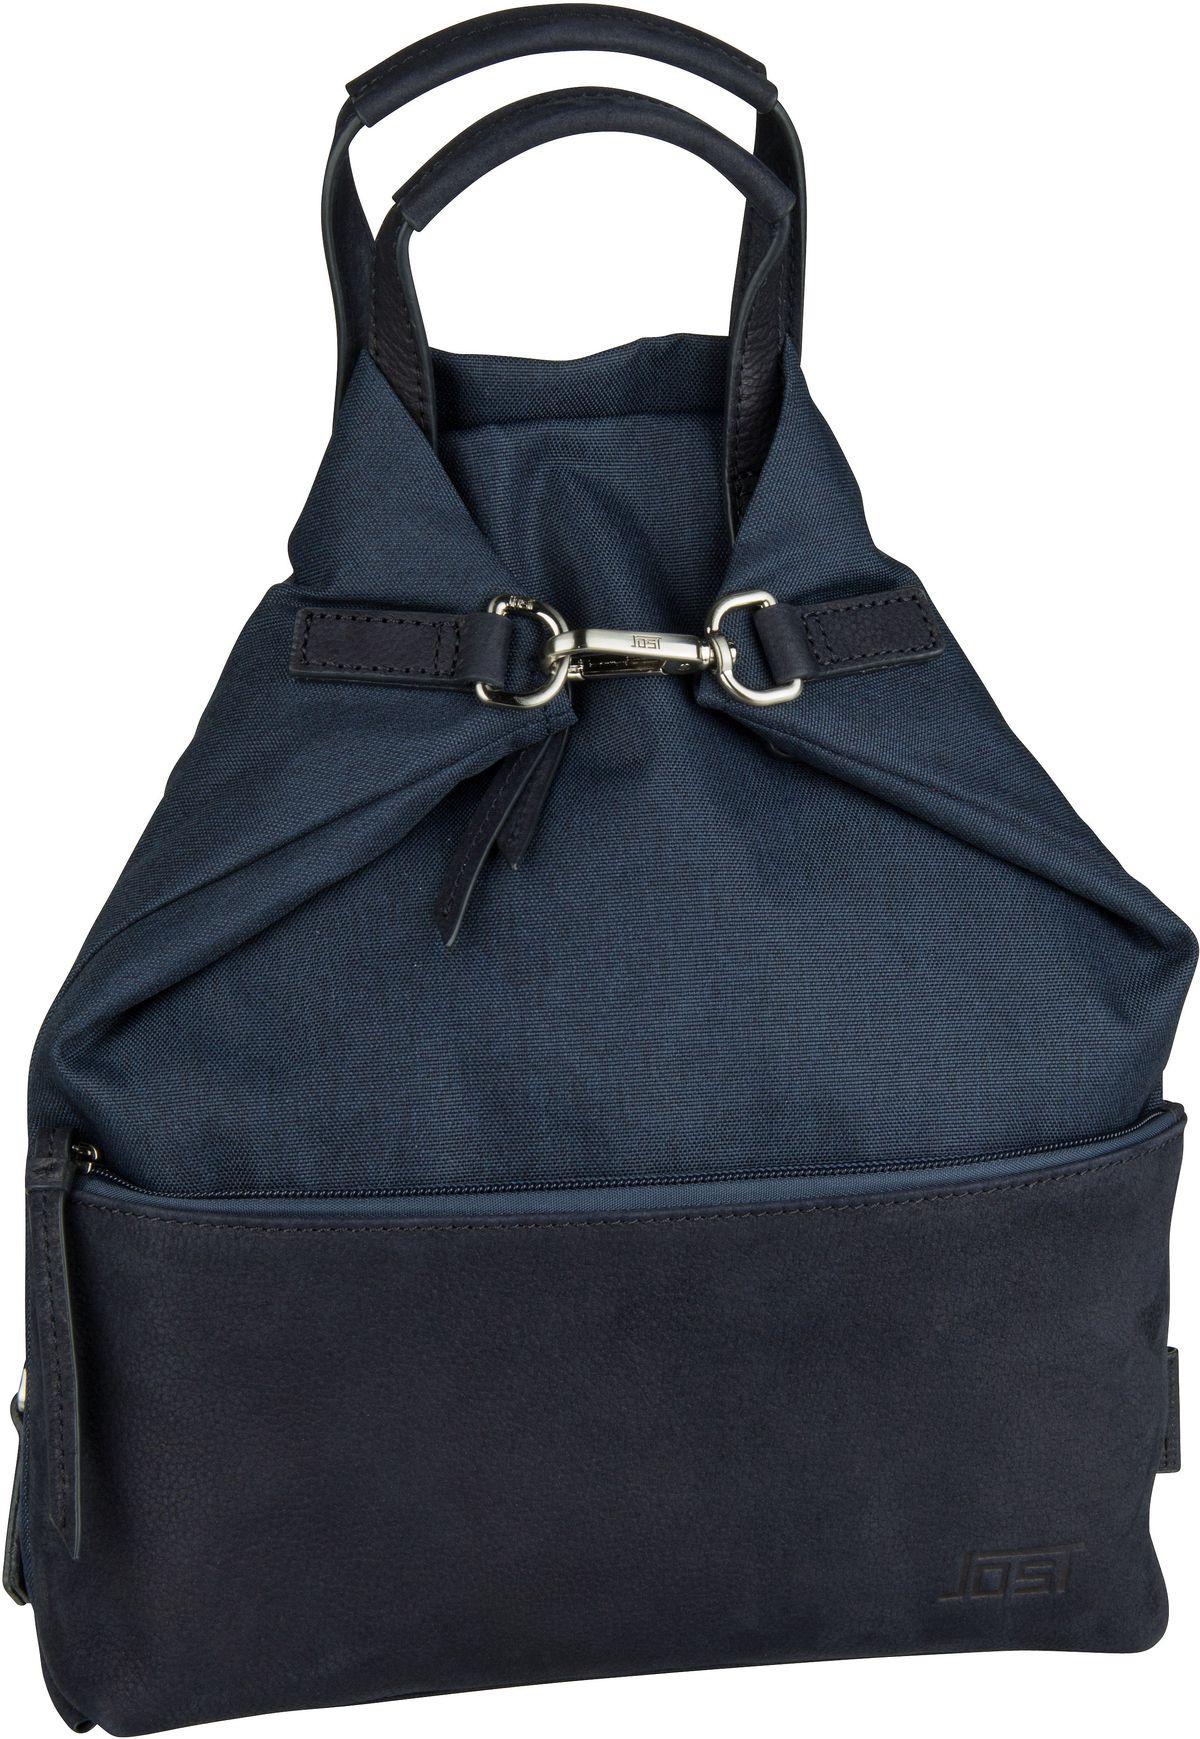 Jost Rucksack / Daypack 2716 X-Change Bag XS Navy